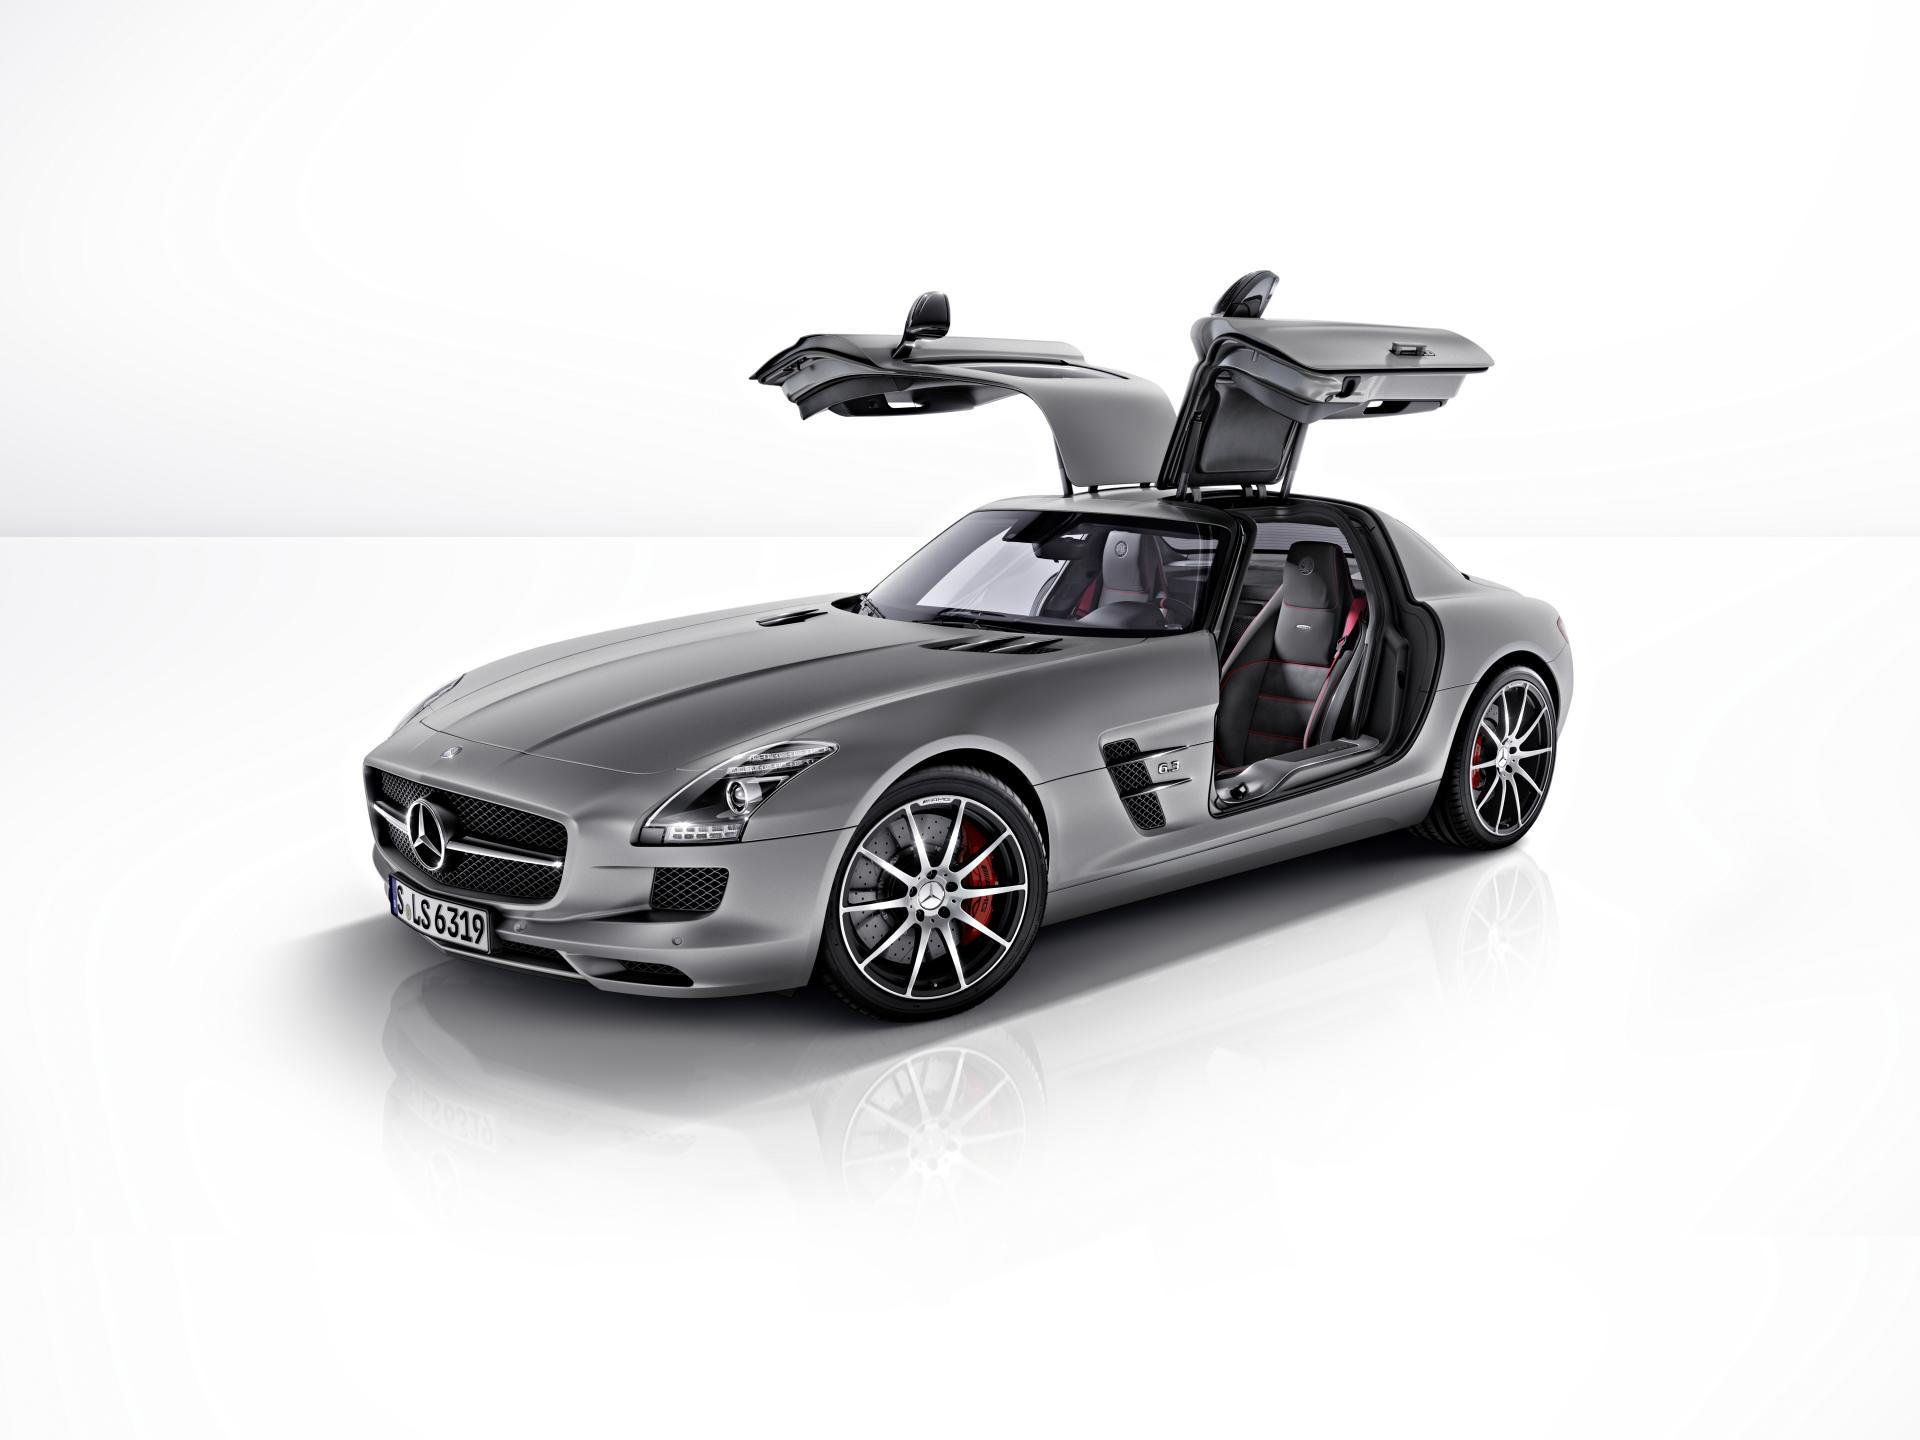 Alfa img showing gt sls amg gt roadster interior - Alfa Img Showing Gt Sls Amg Gt Roadster Interior 24